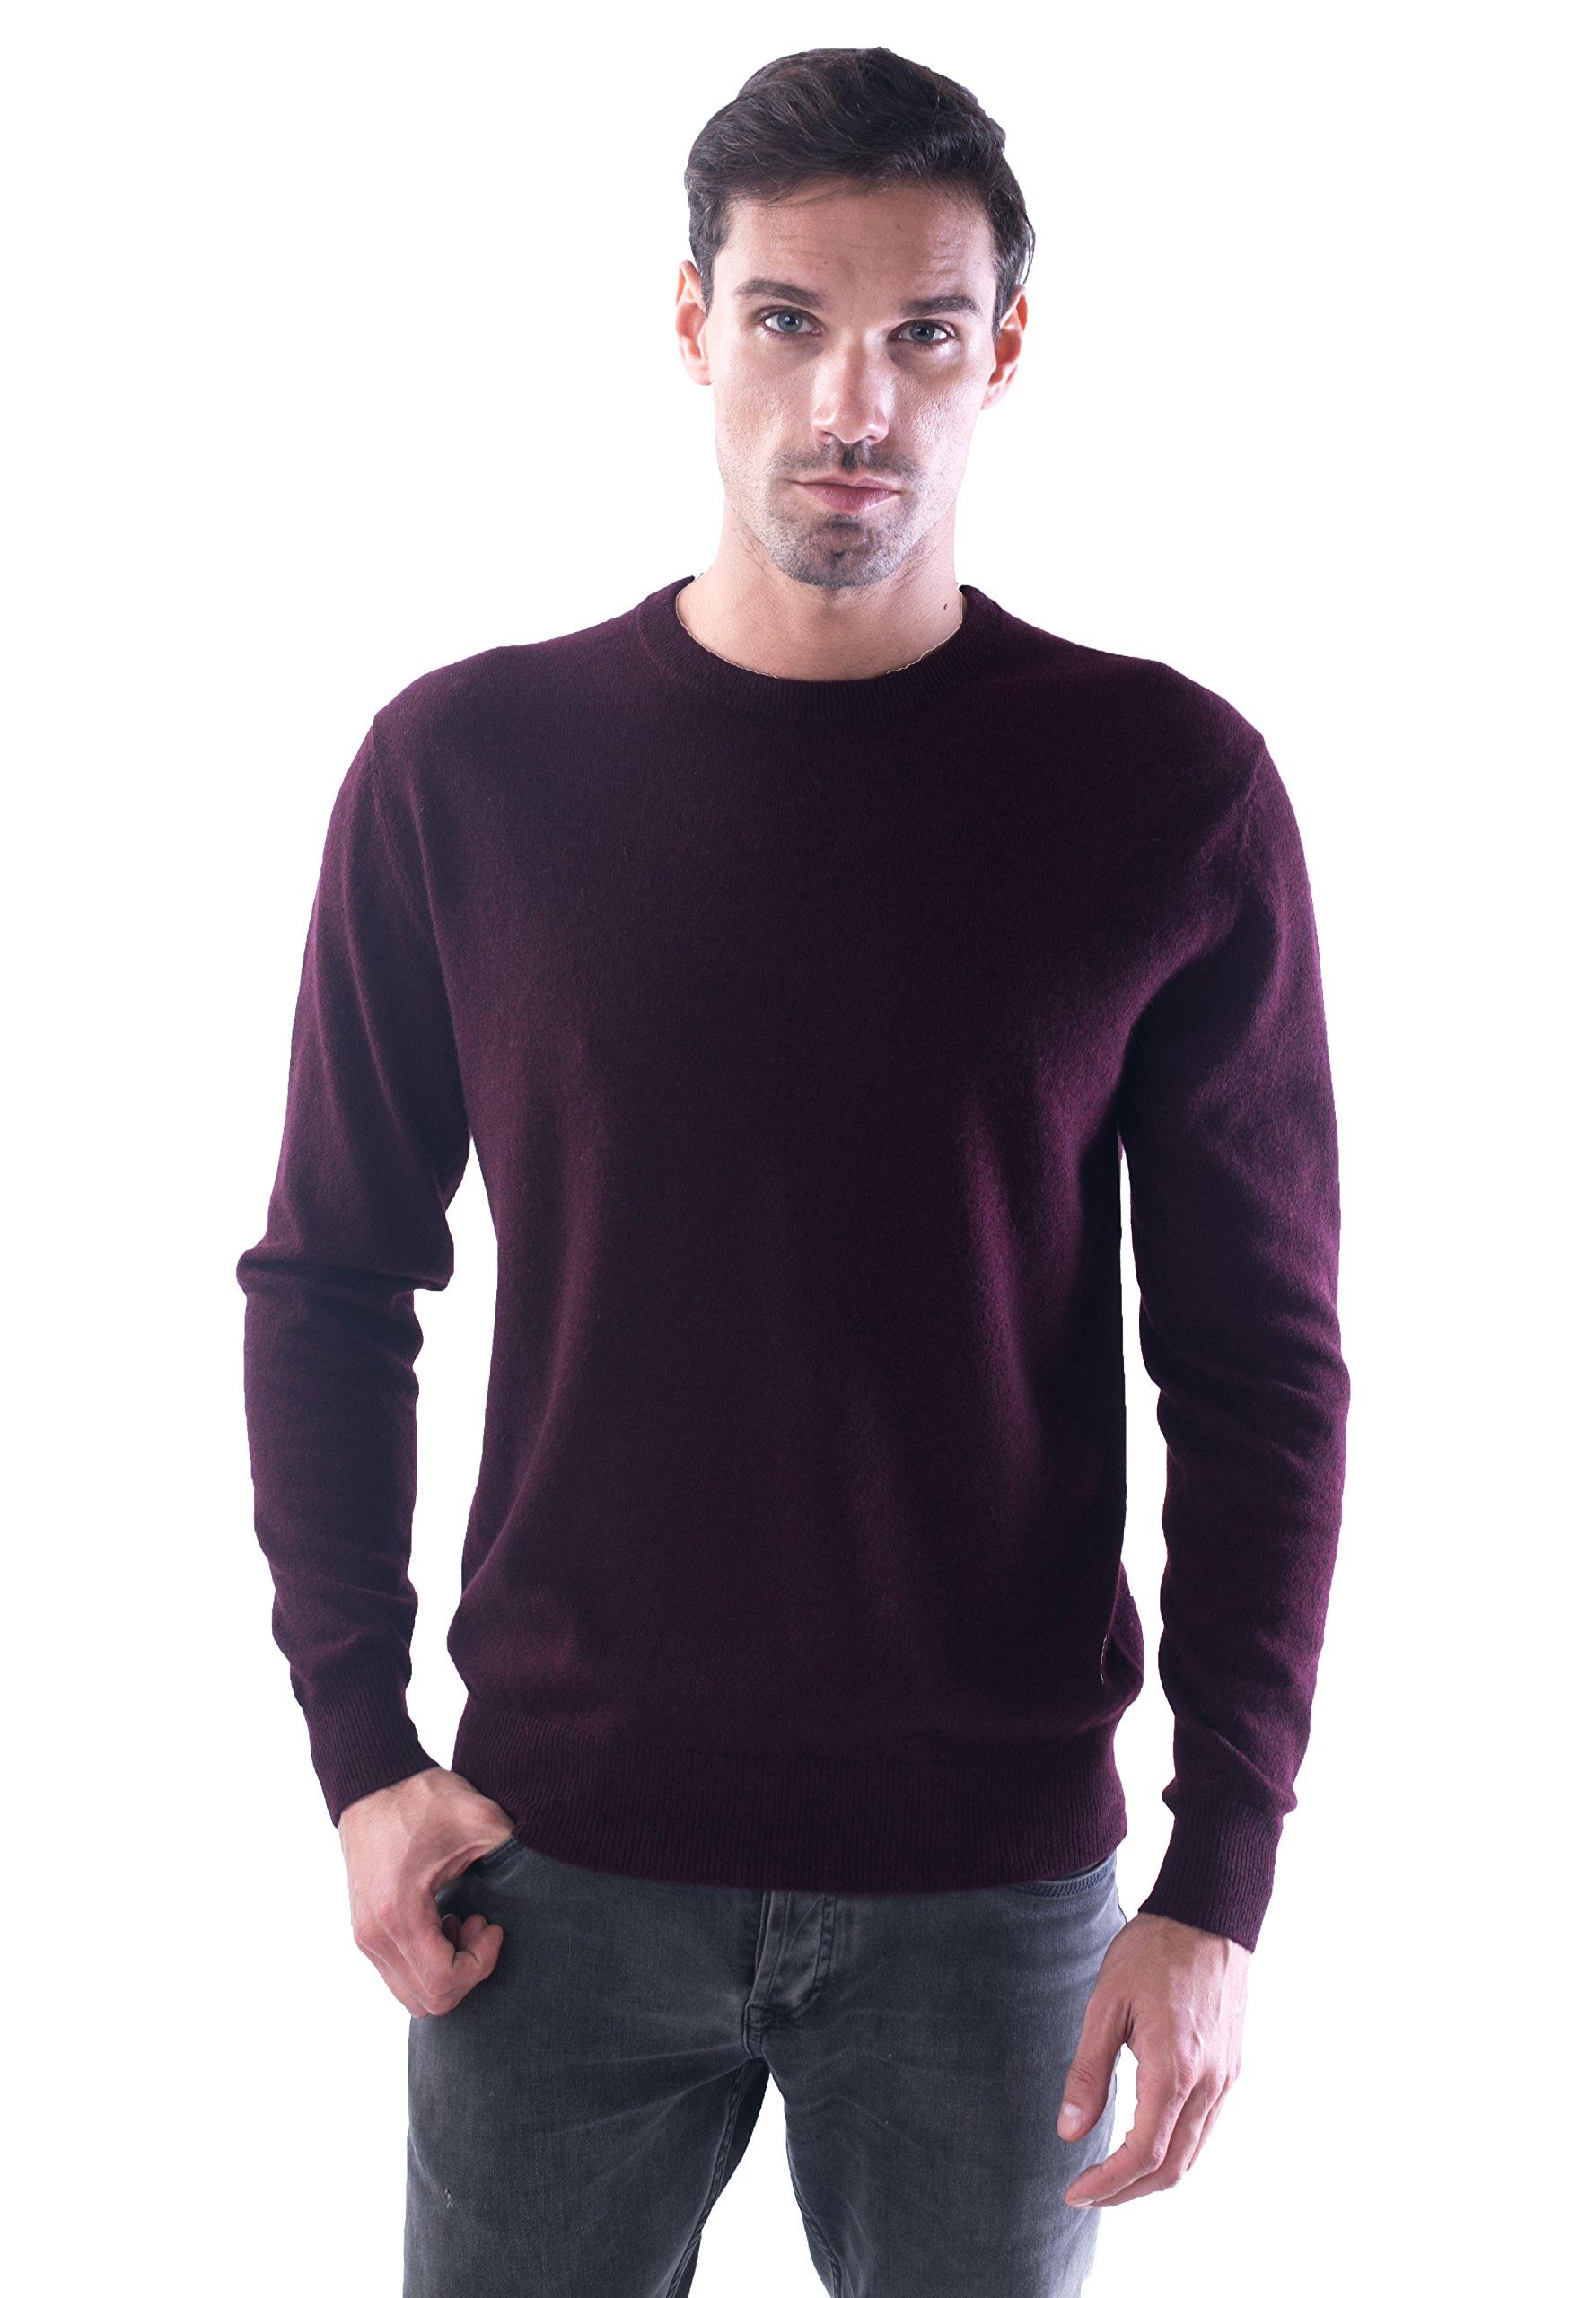 LEBAC Men's 100% Cashmere Round Neck Sweater